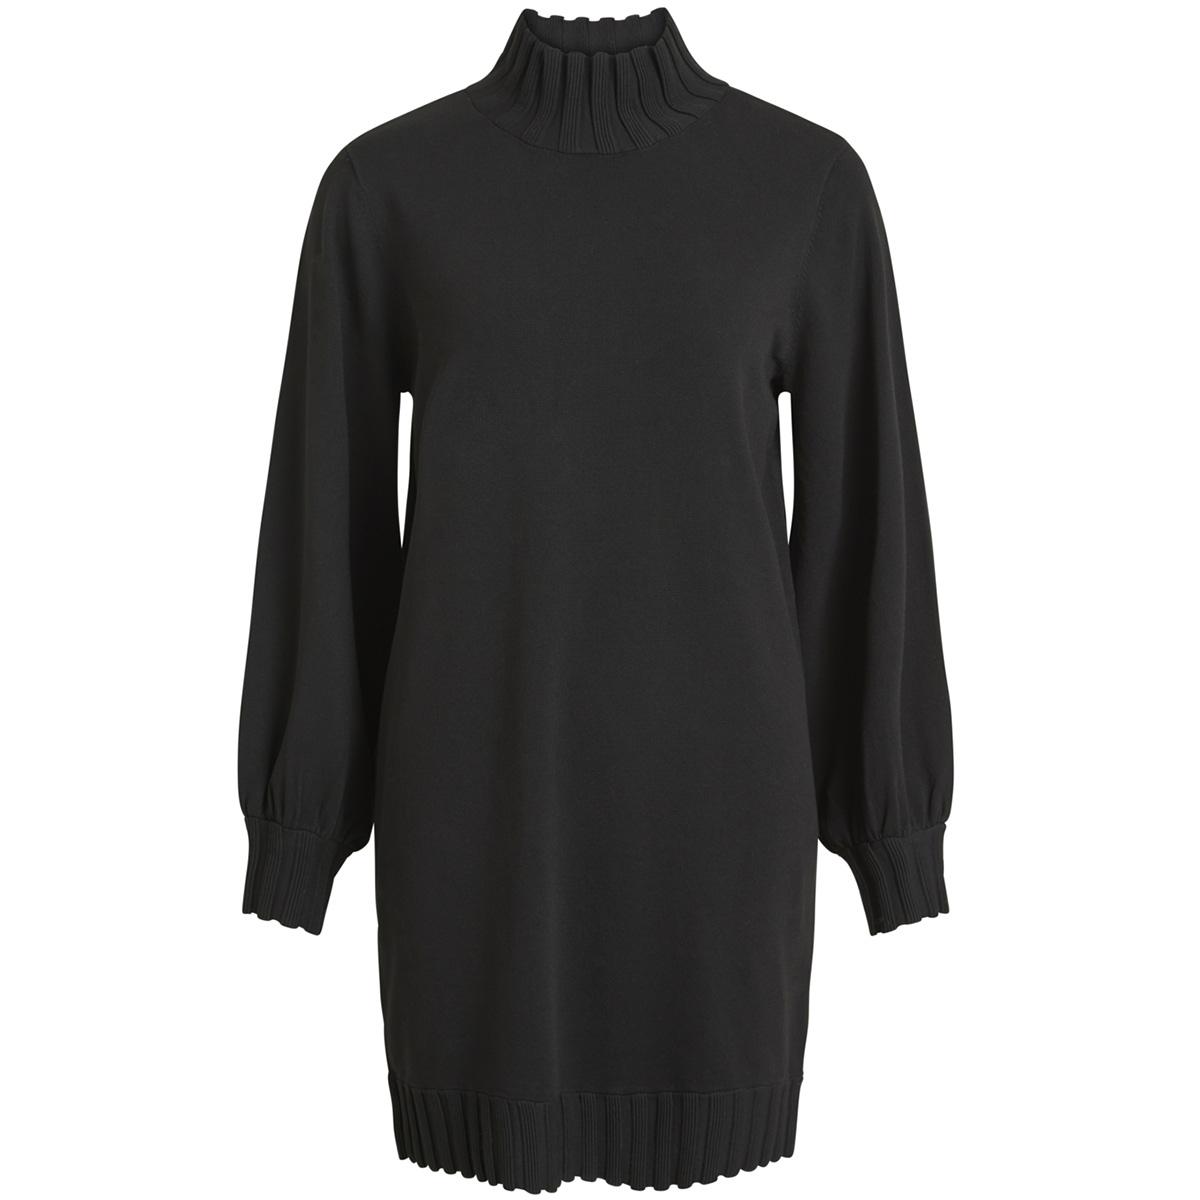 objdillinger l/s highneck dress 98 23027330 object jurk black